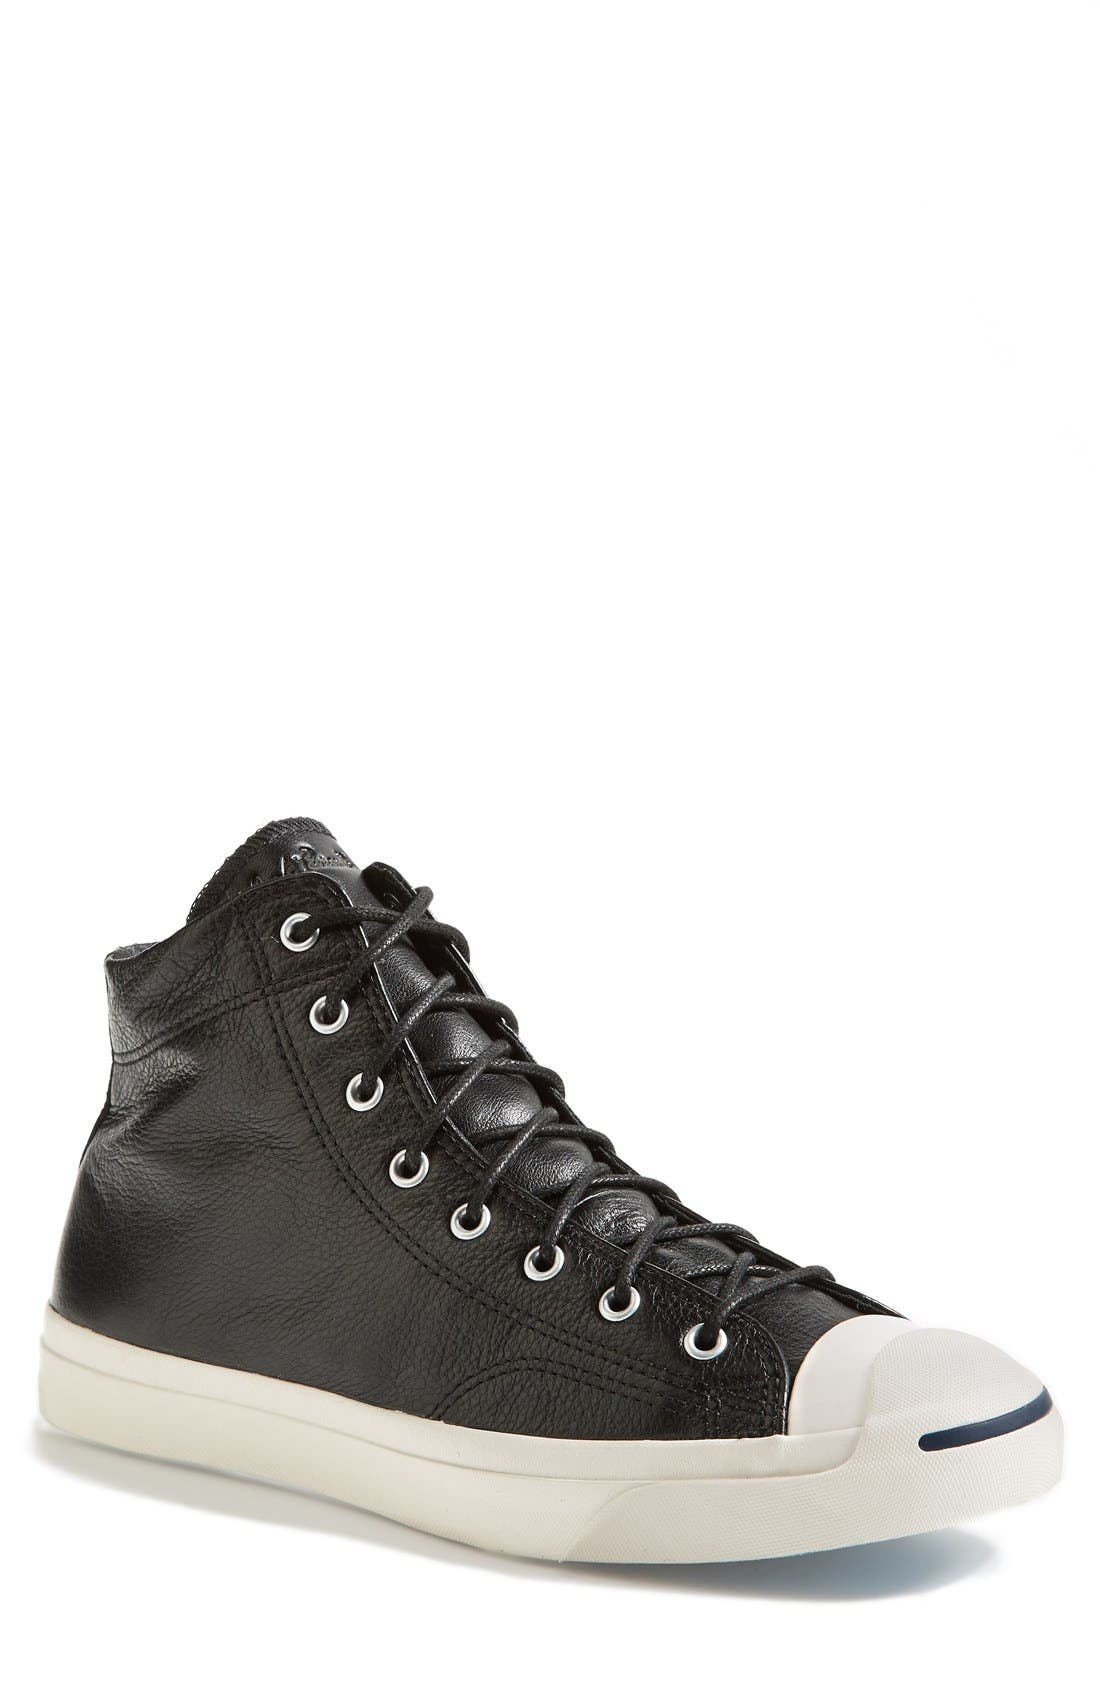 Alternate Image 1 Selected - Converse 'Jack Purcell - Jack Mid' Sneaker (Men) (Online Only)